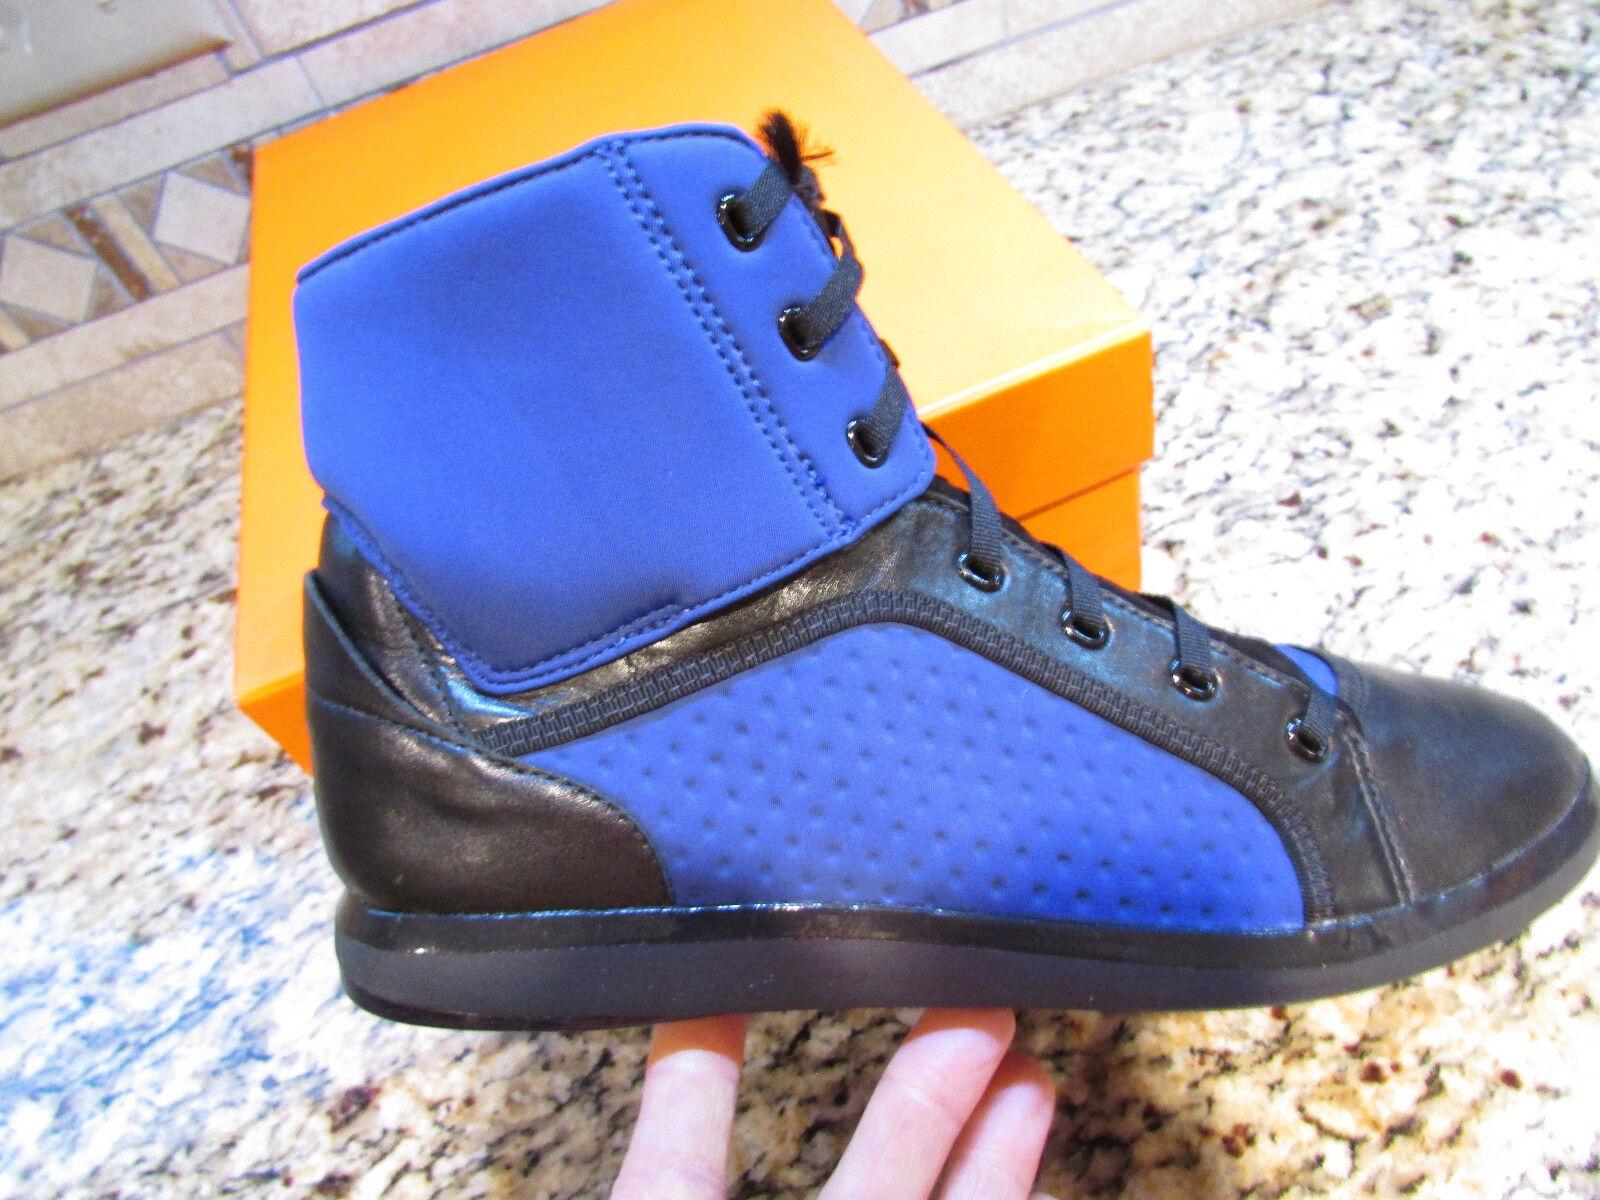 Nuove adidas oe 7,5 shizuka alte scarpe femminili 7,5 oe oe di yohji yamamoto libera la nave 6a3234